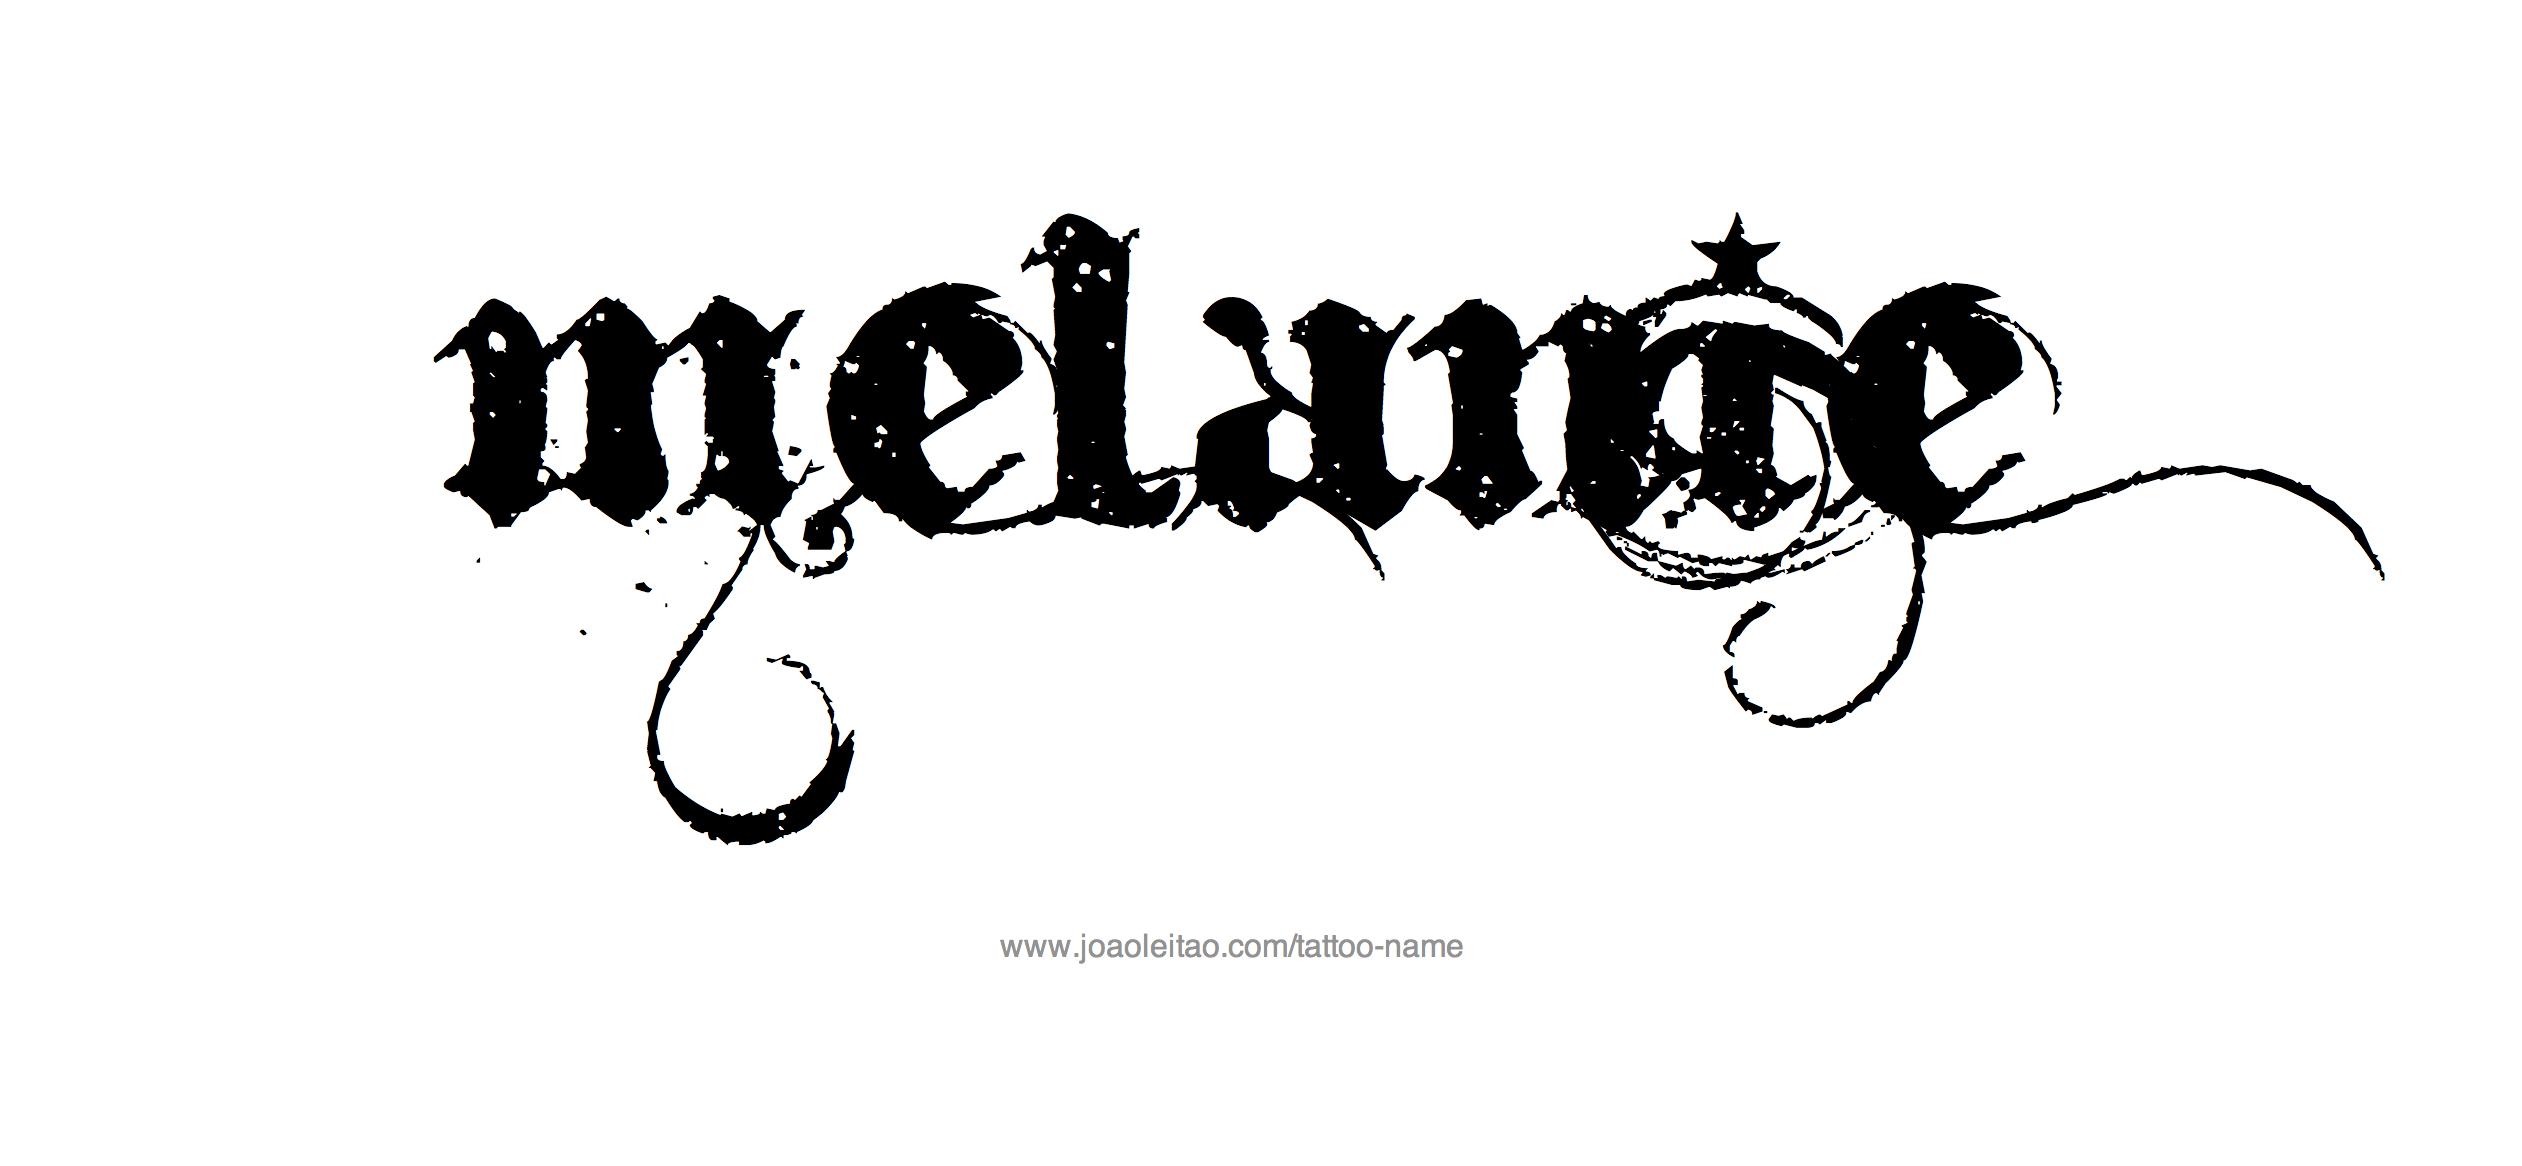 melania name tattoo designs